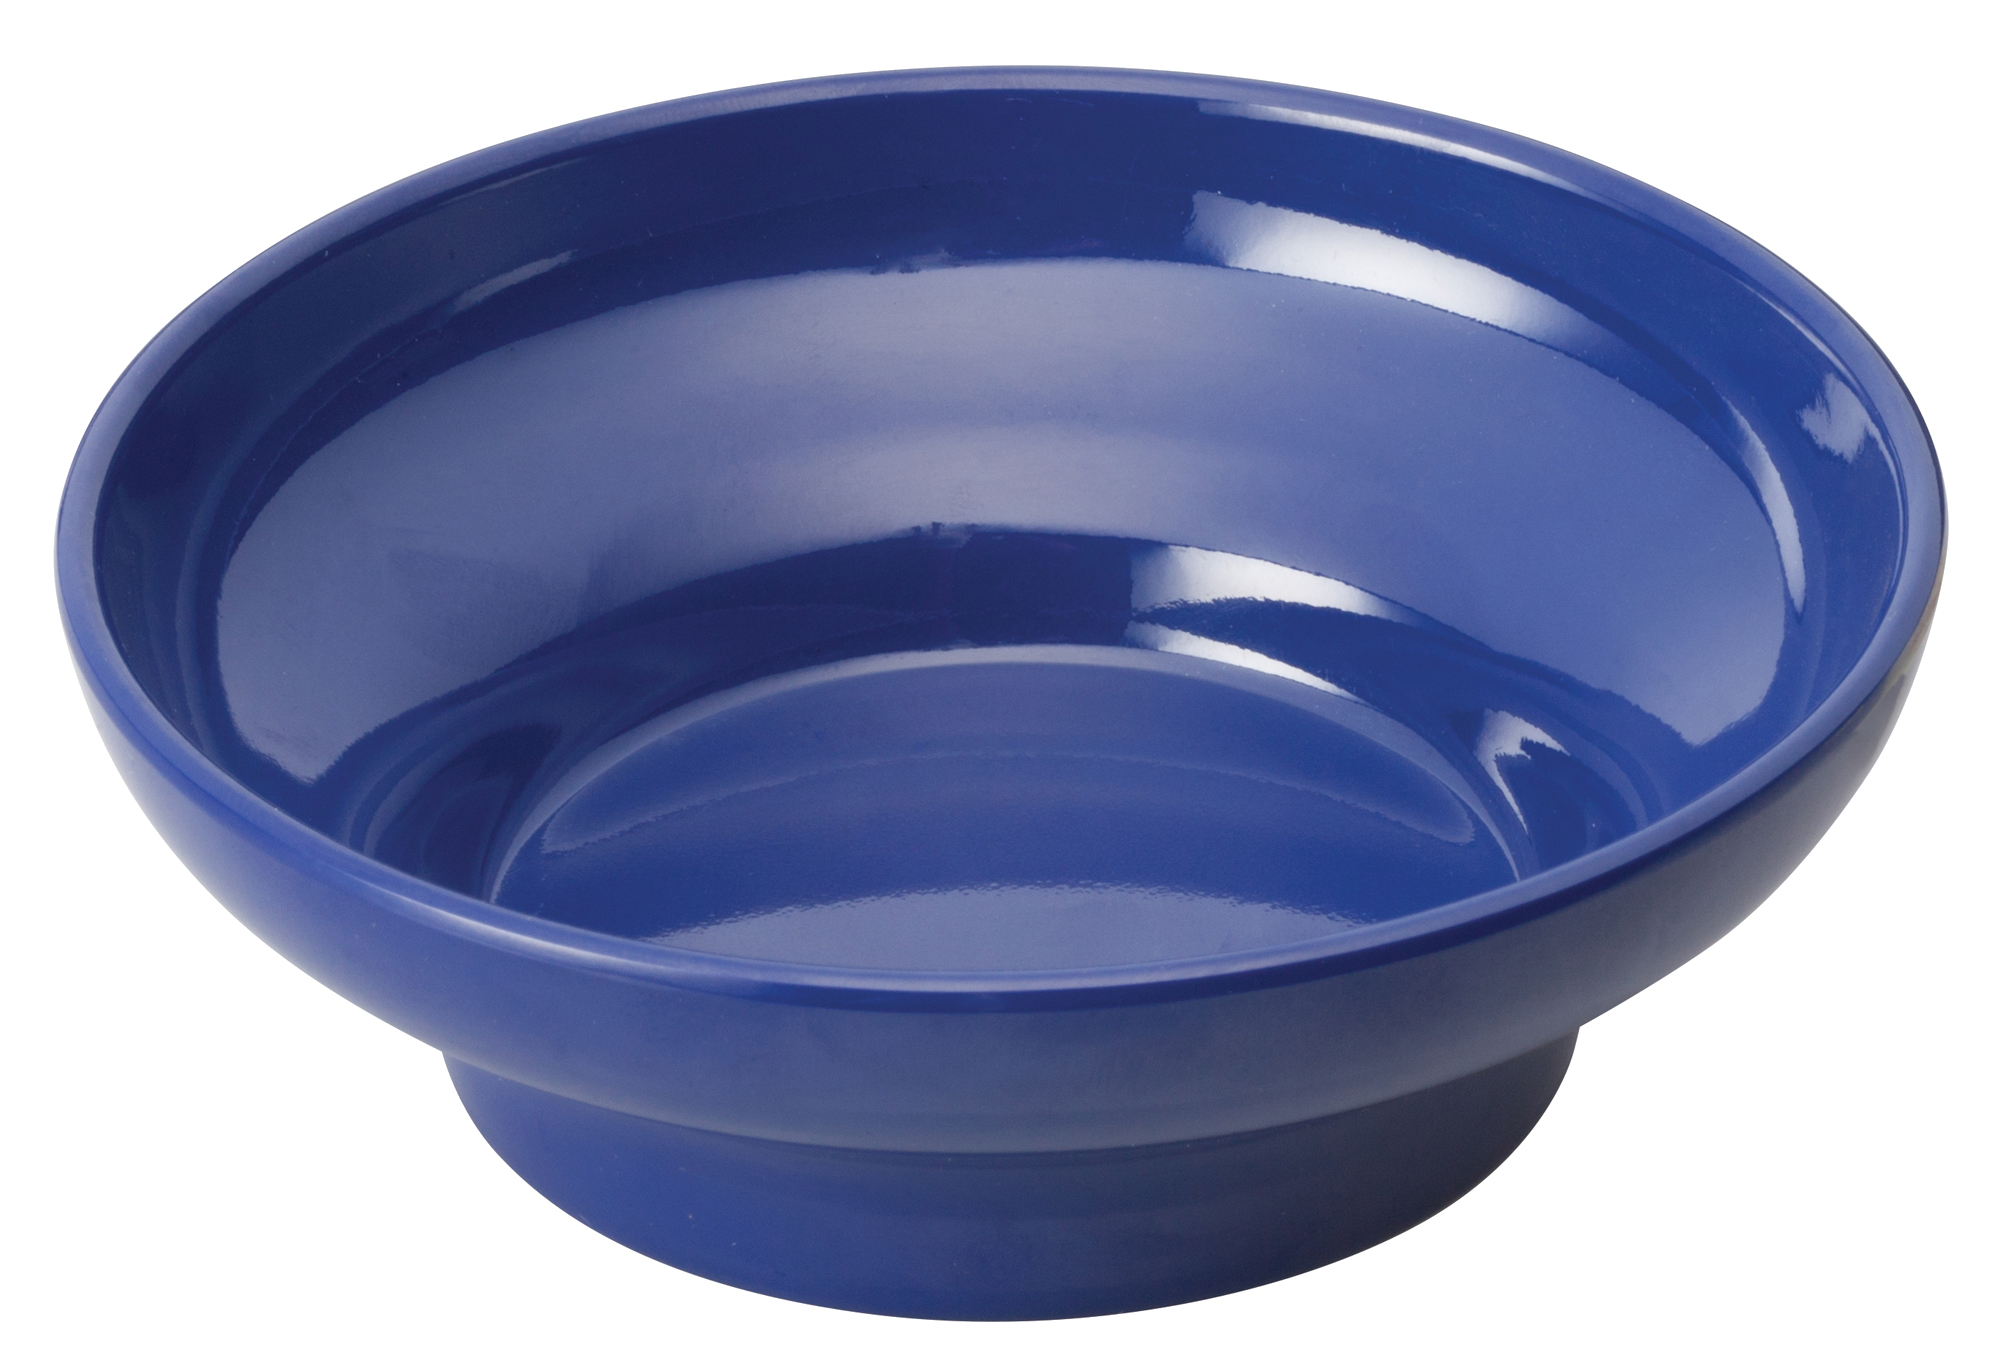 Winco WDM008-402 sauce dish, plastic